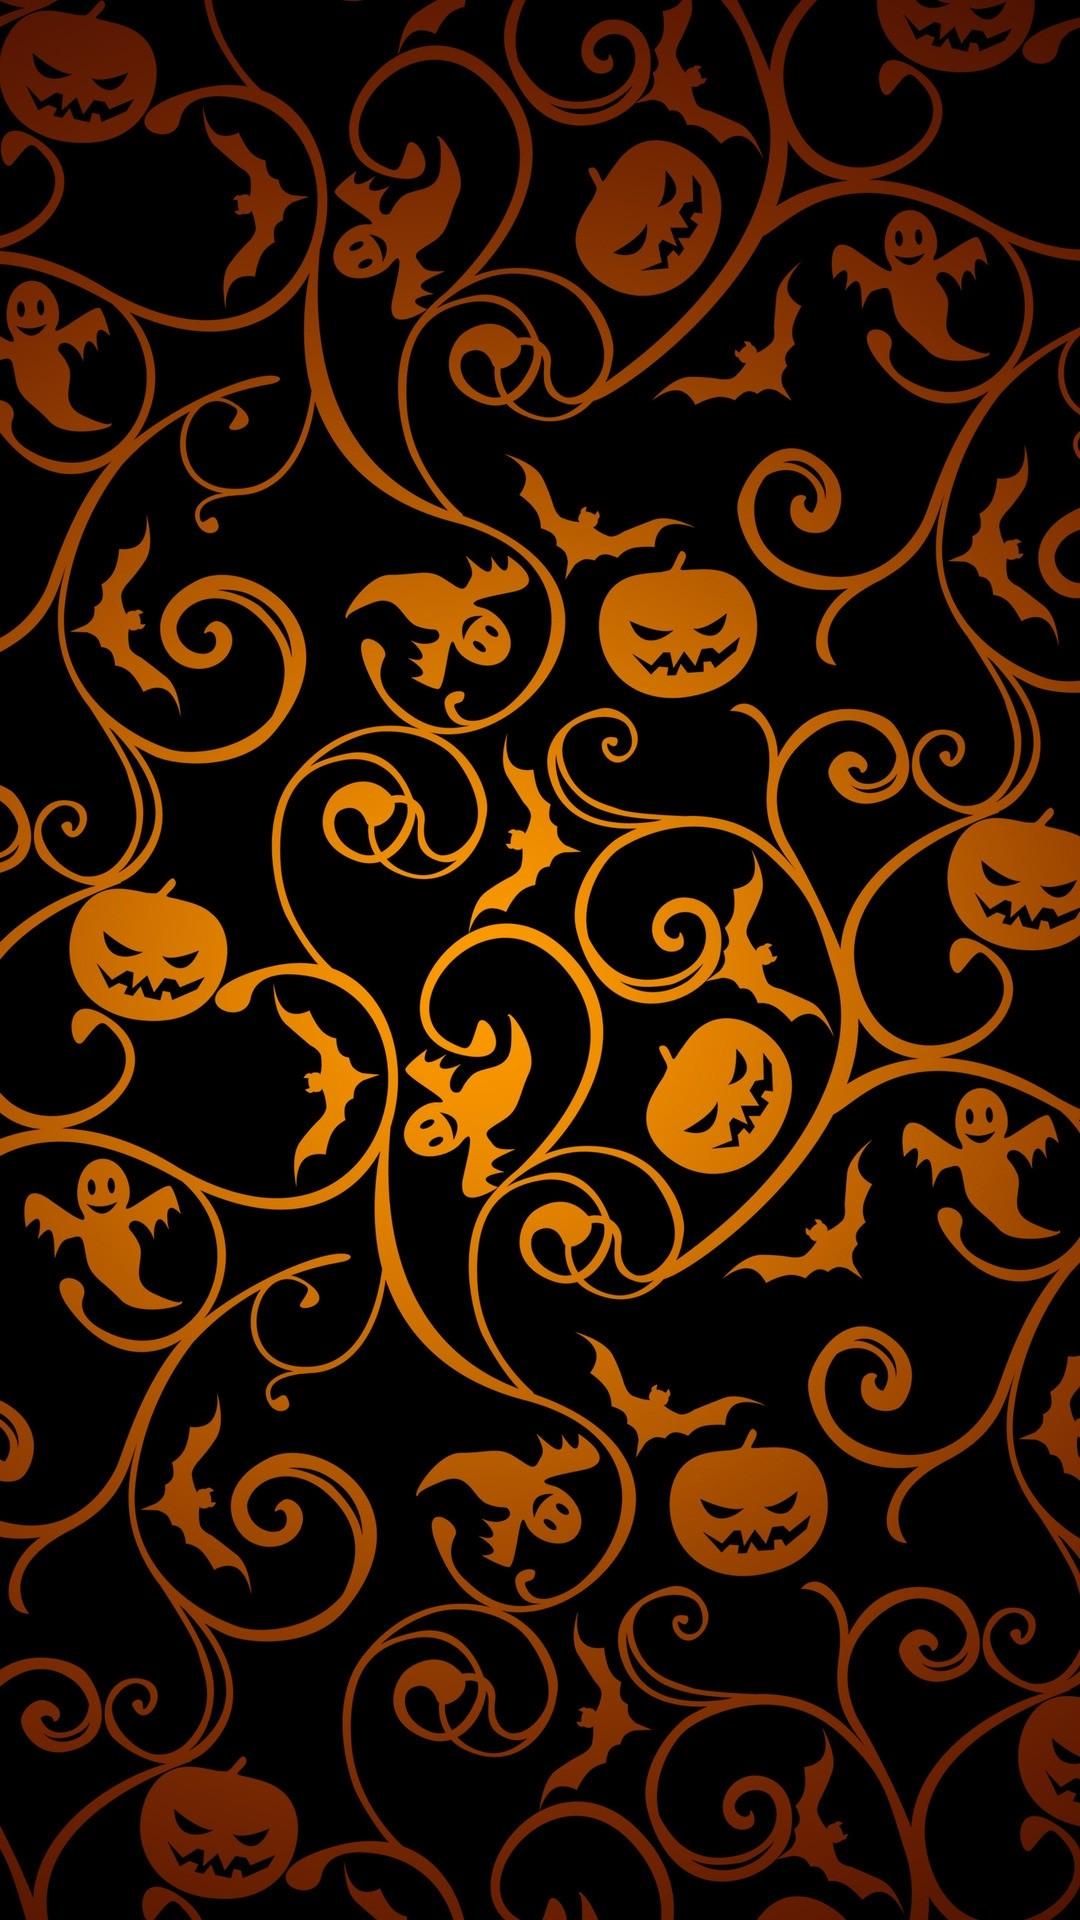 Cute Halloween iPhone wallpaper